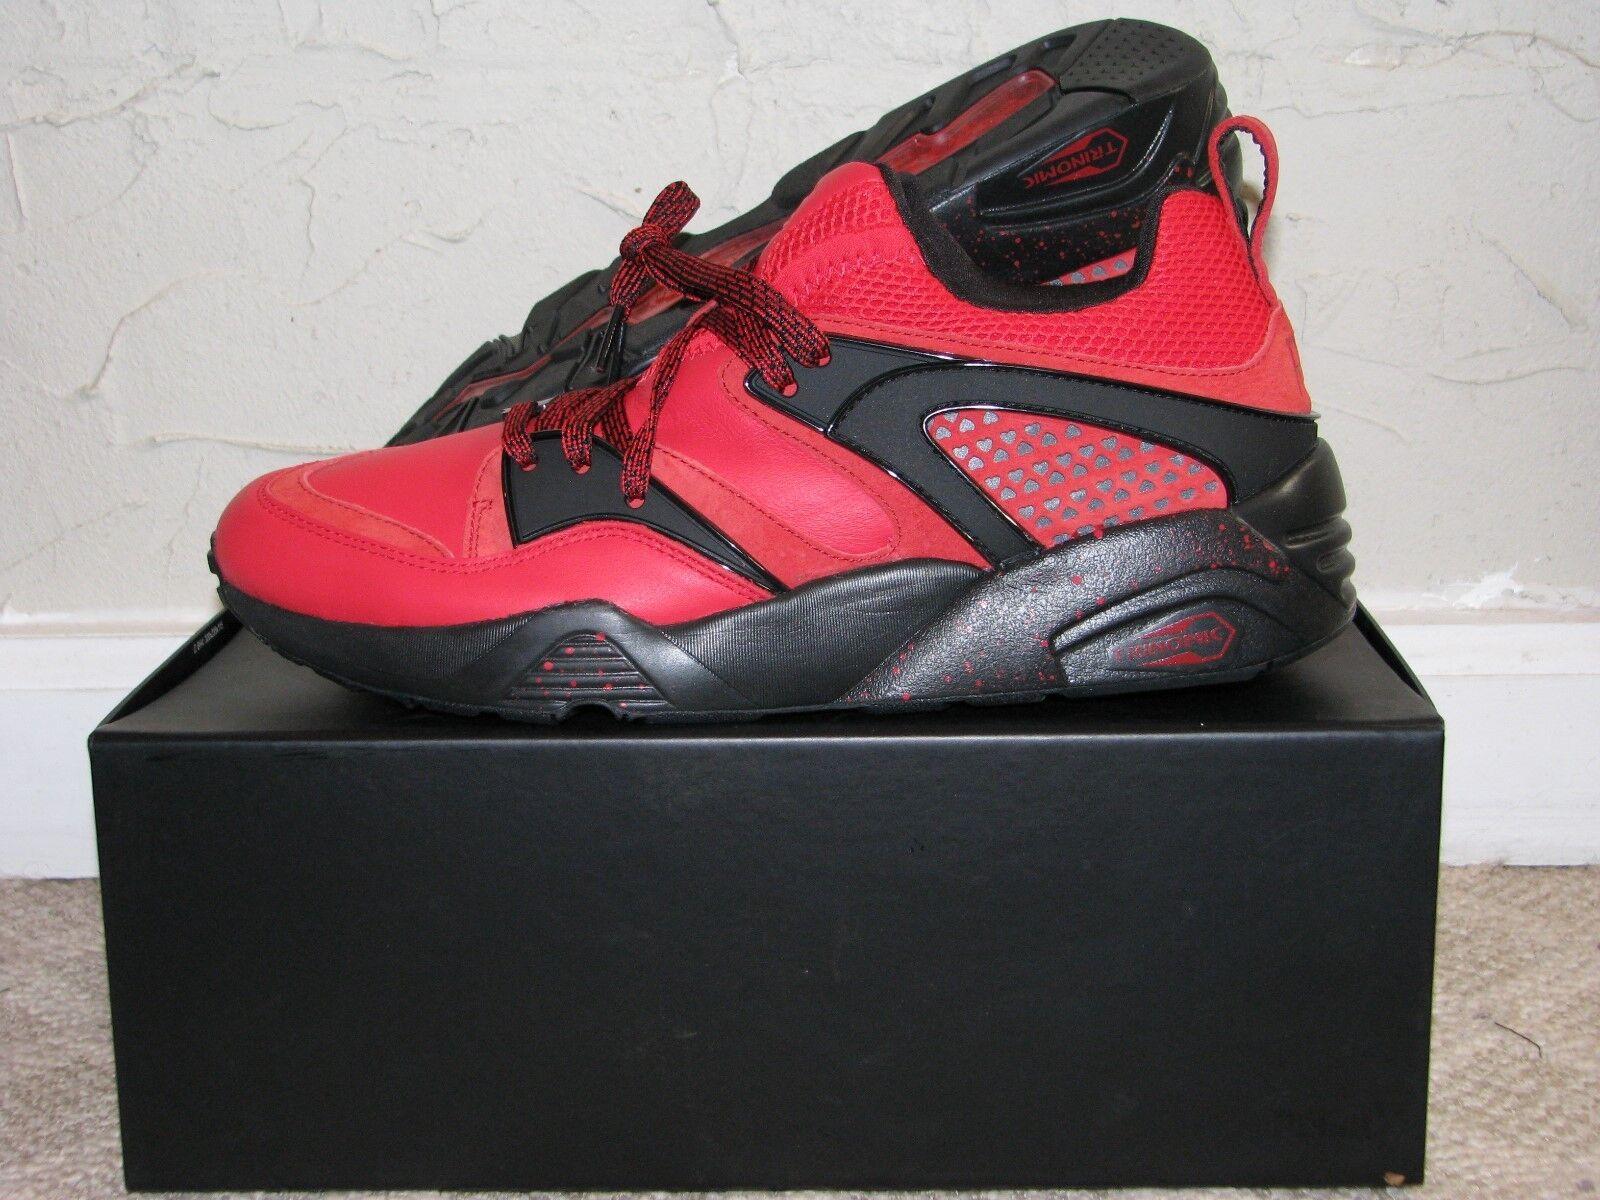 Rise NYC x PUMA Blaze Of Glory Red/Black Mens Comfortable